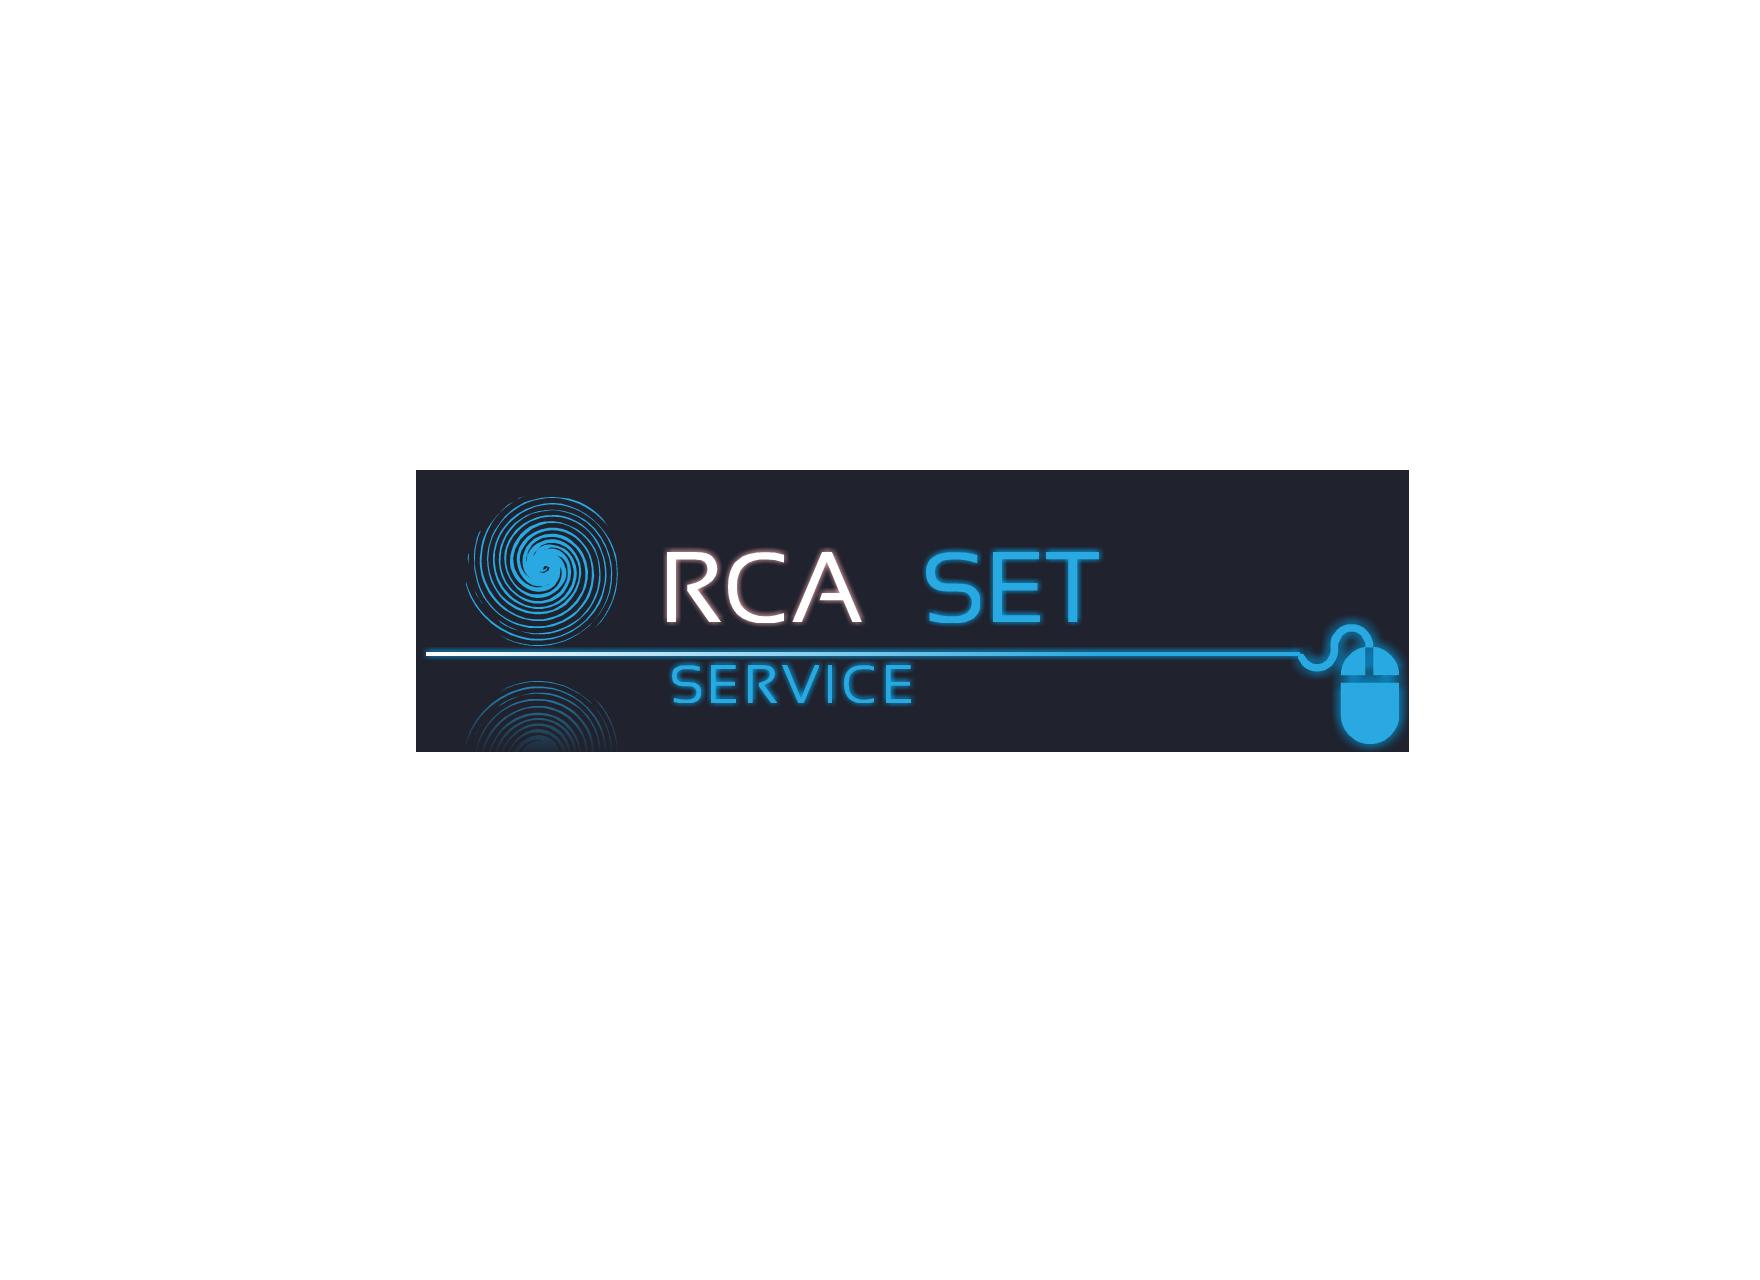 RCA-SET-SERVICE